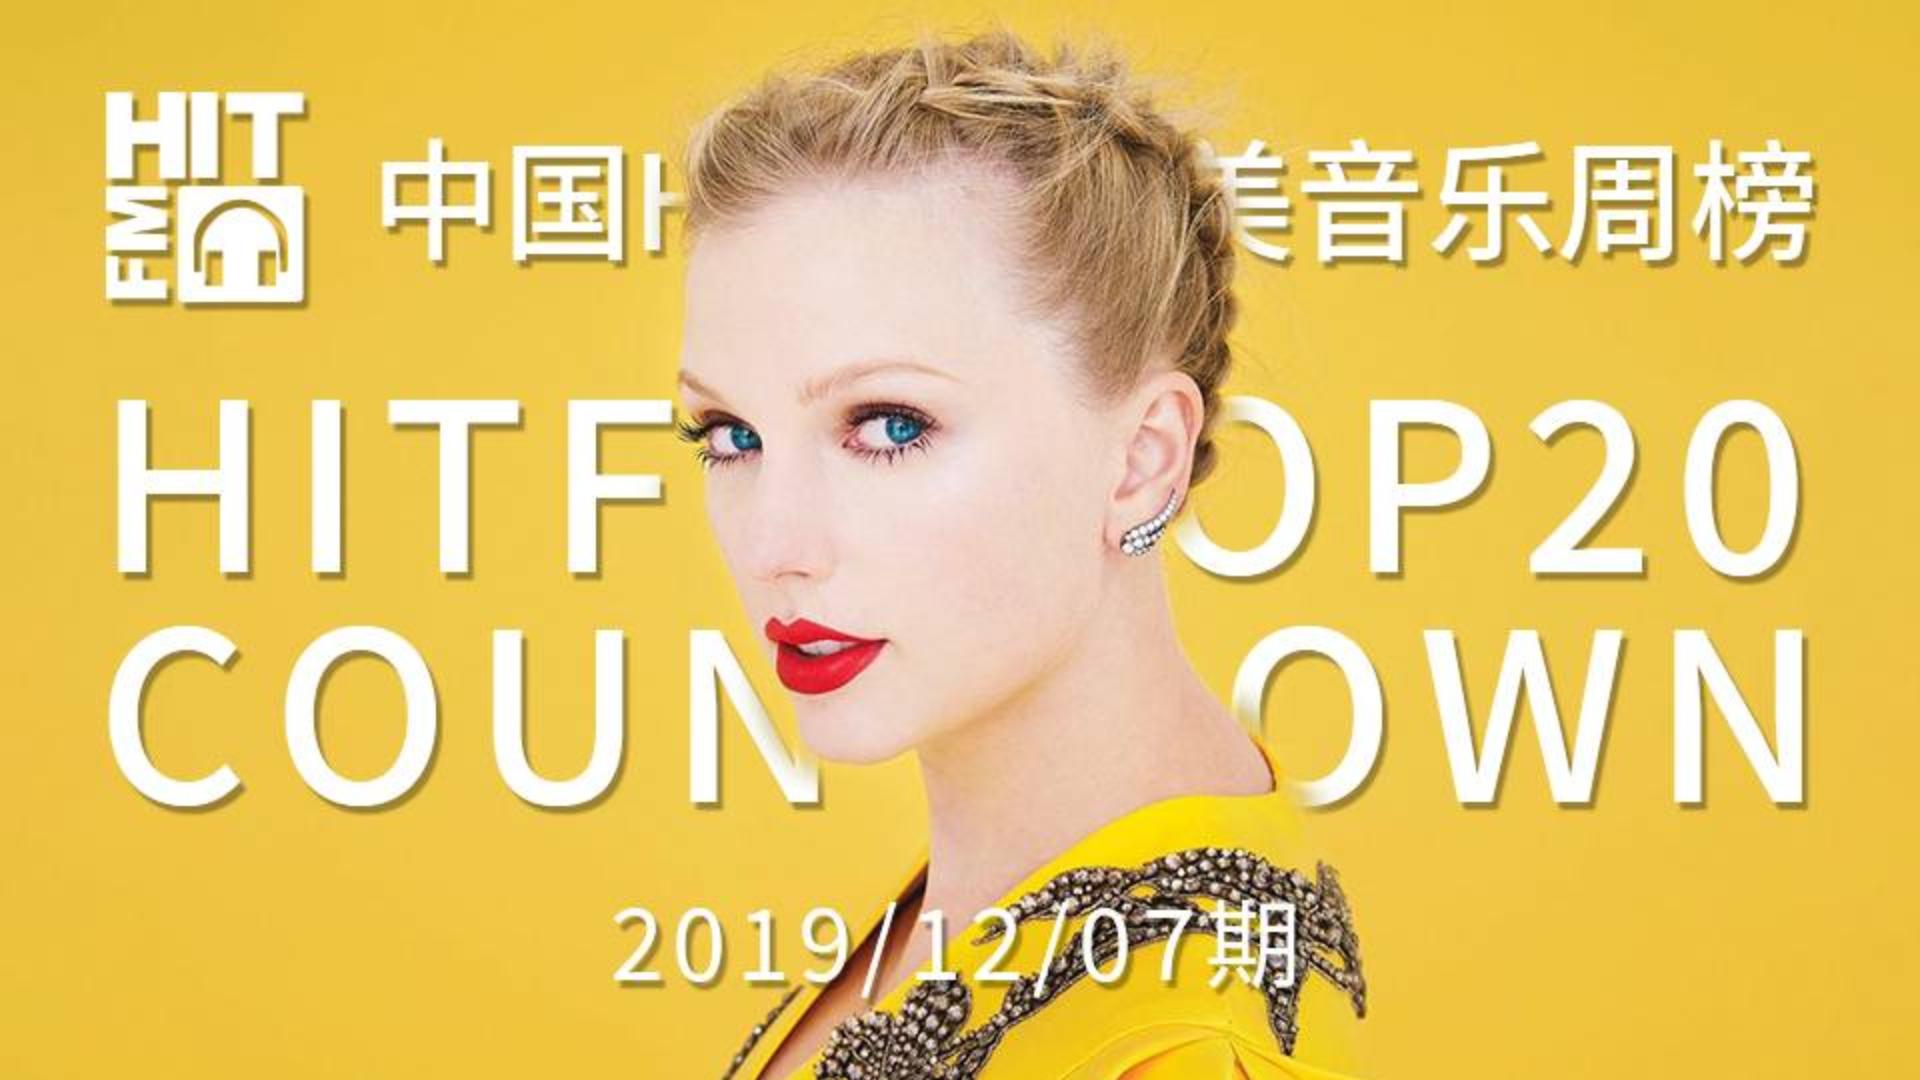 【HITFM】中国HITFM欧美音乐周榜HITFM TOP20 Countdown 20191207